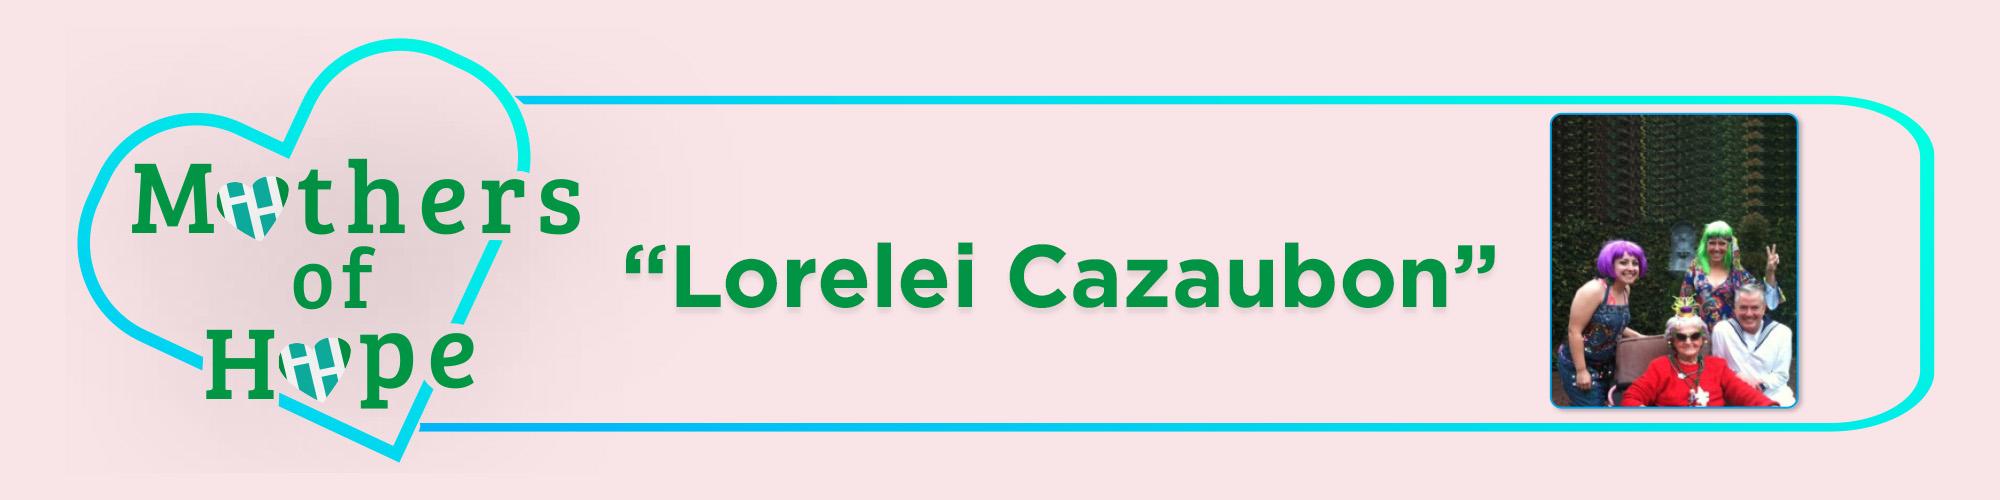 Lorelei-Cazaubon